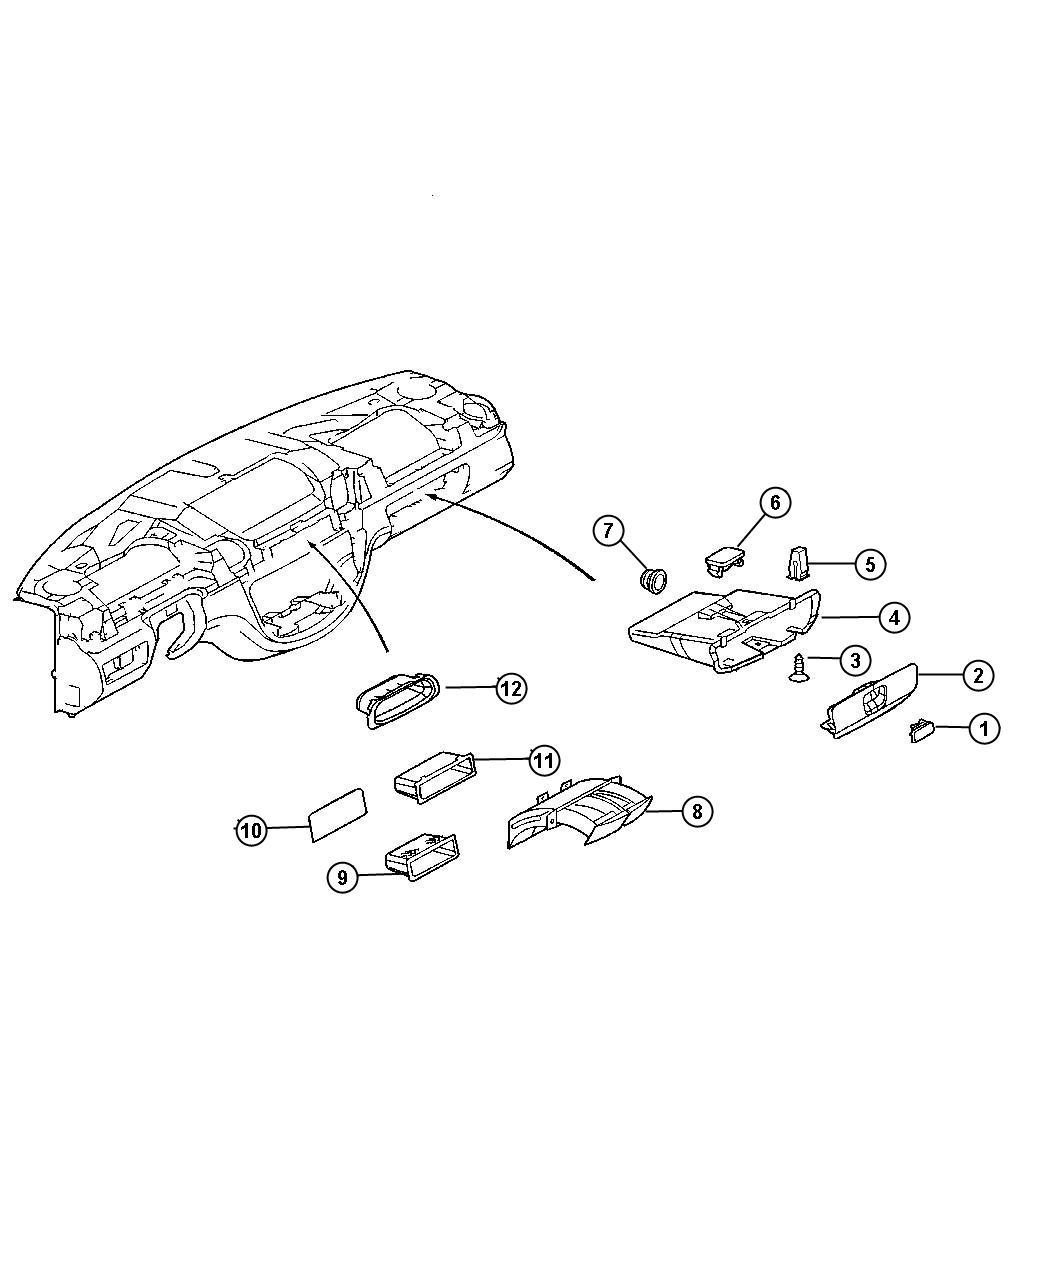 2005 Dodge Sprinter 2500 Plug. Instrument panel